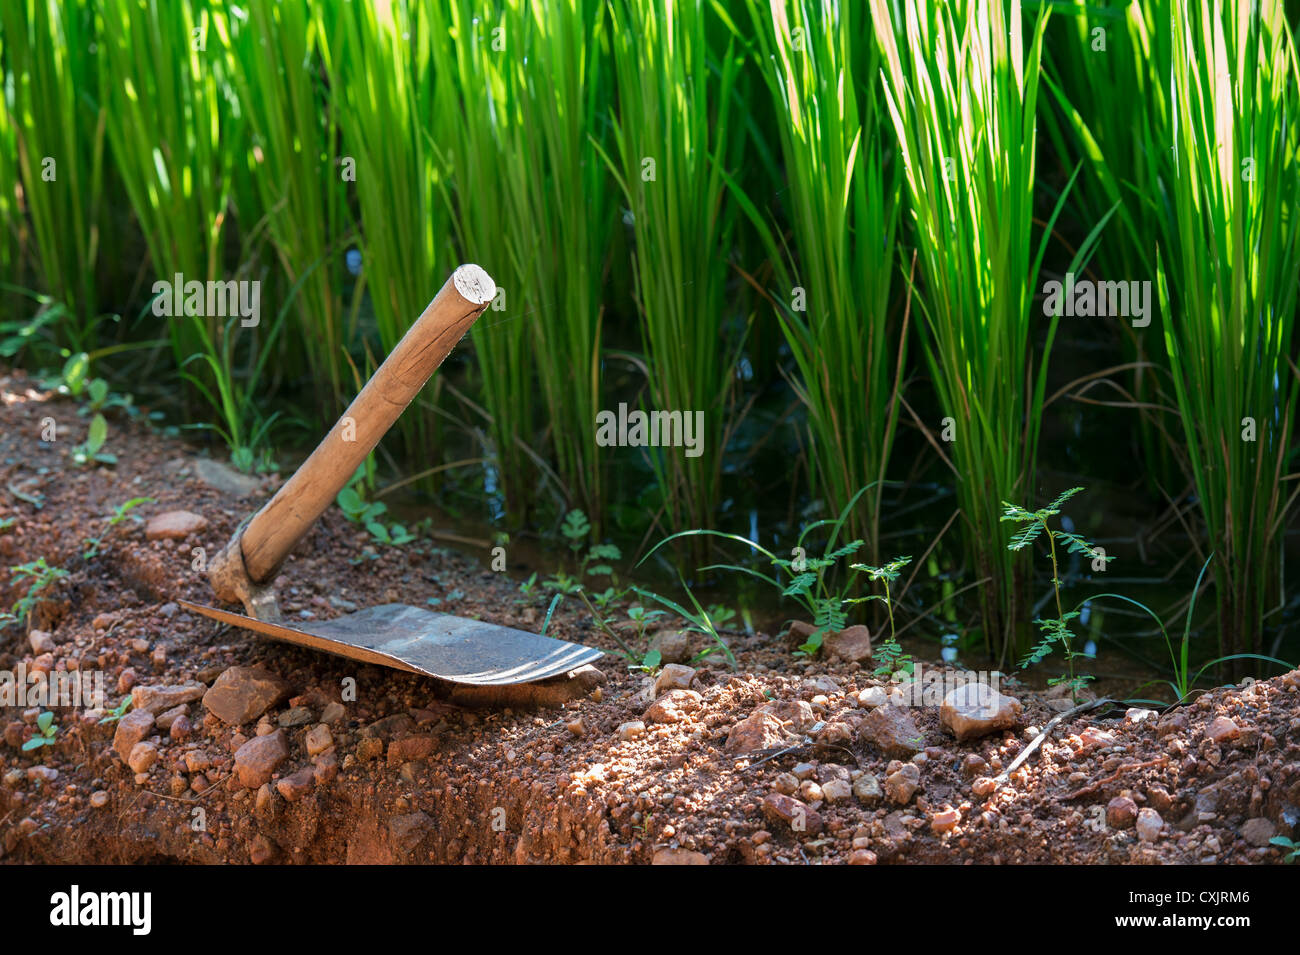 Farming tools stockfotos farming tools bilder alamy for Indischer holztisch